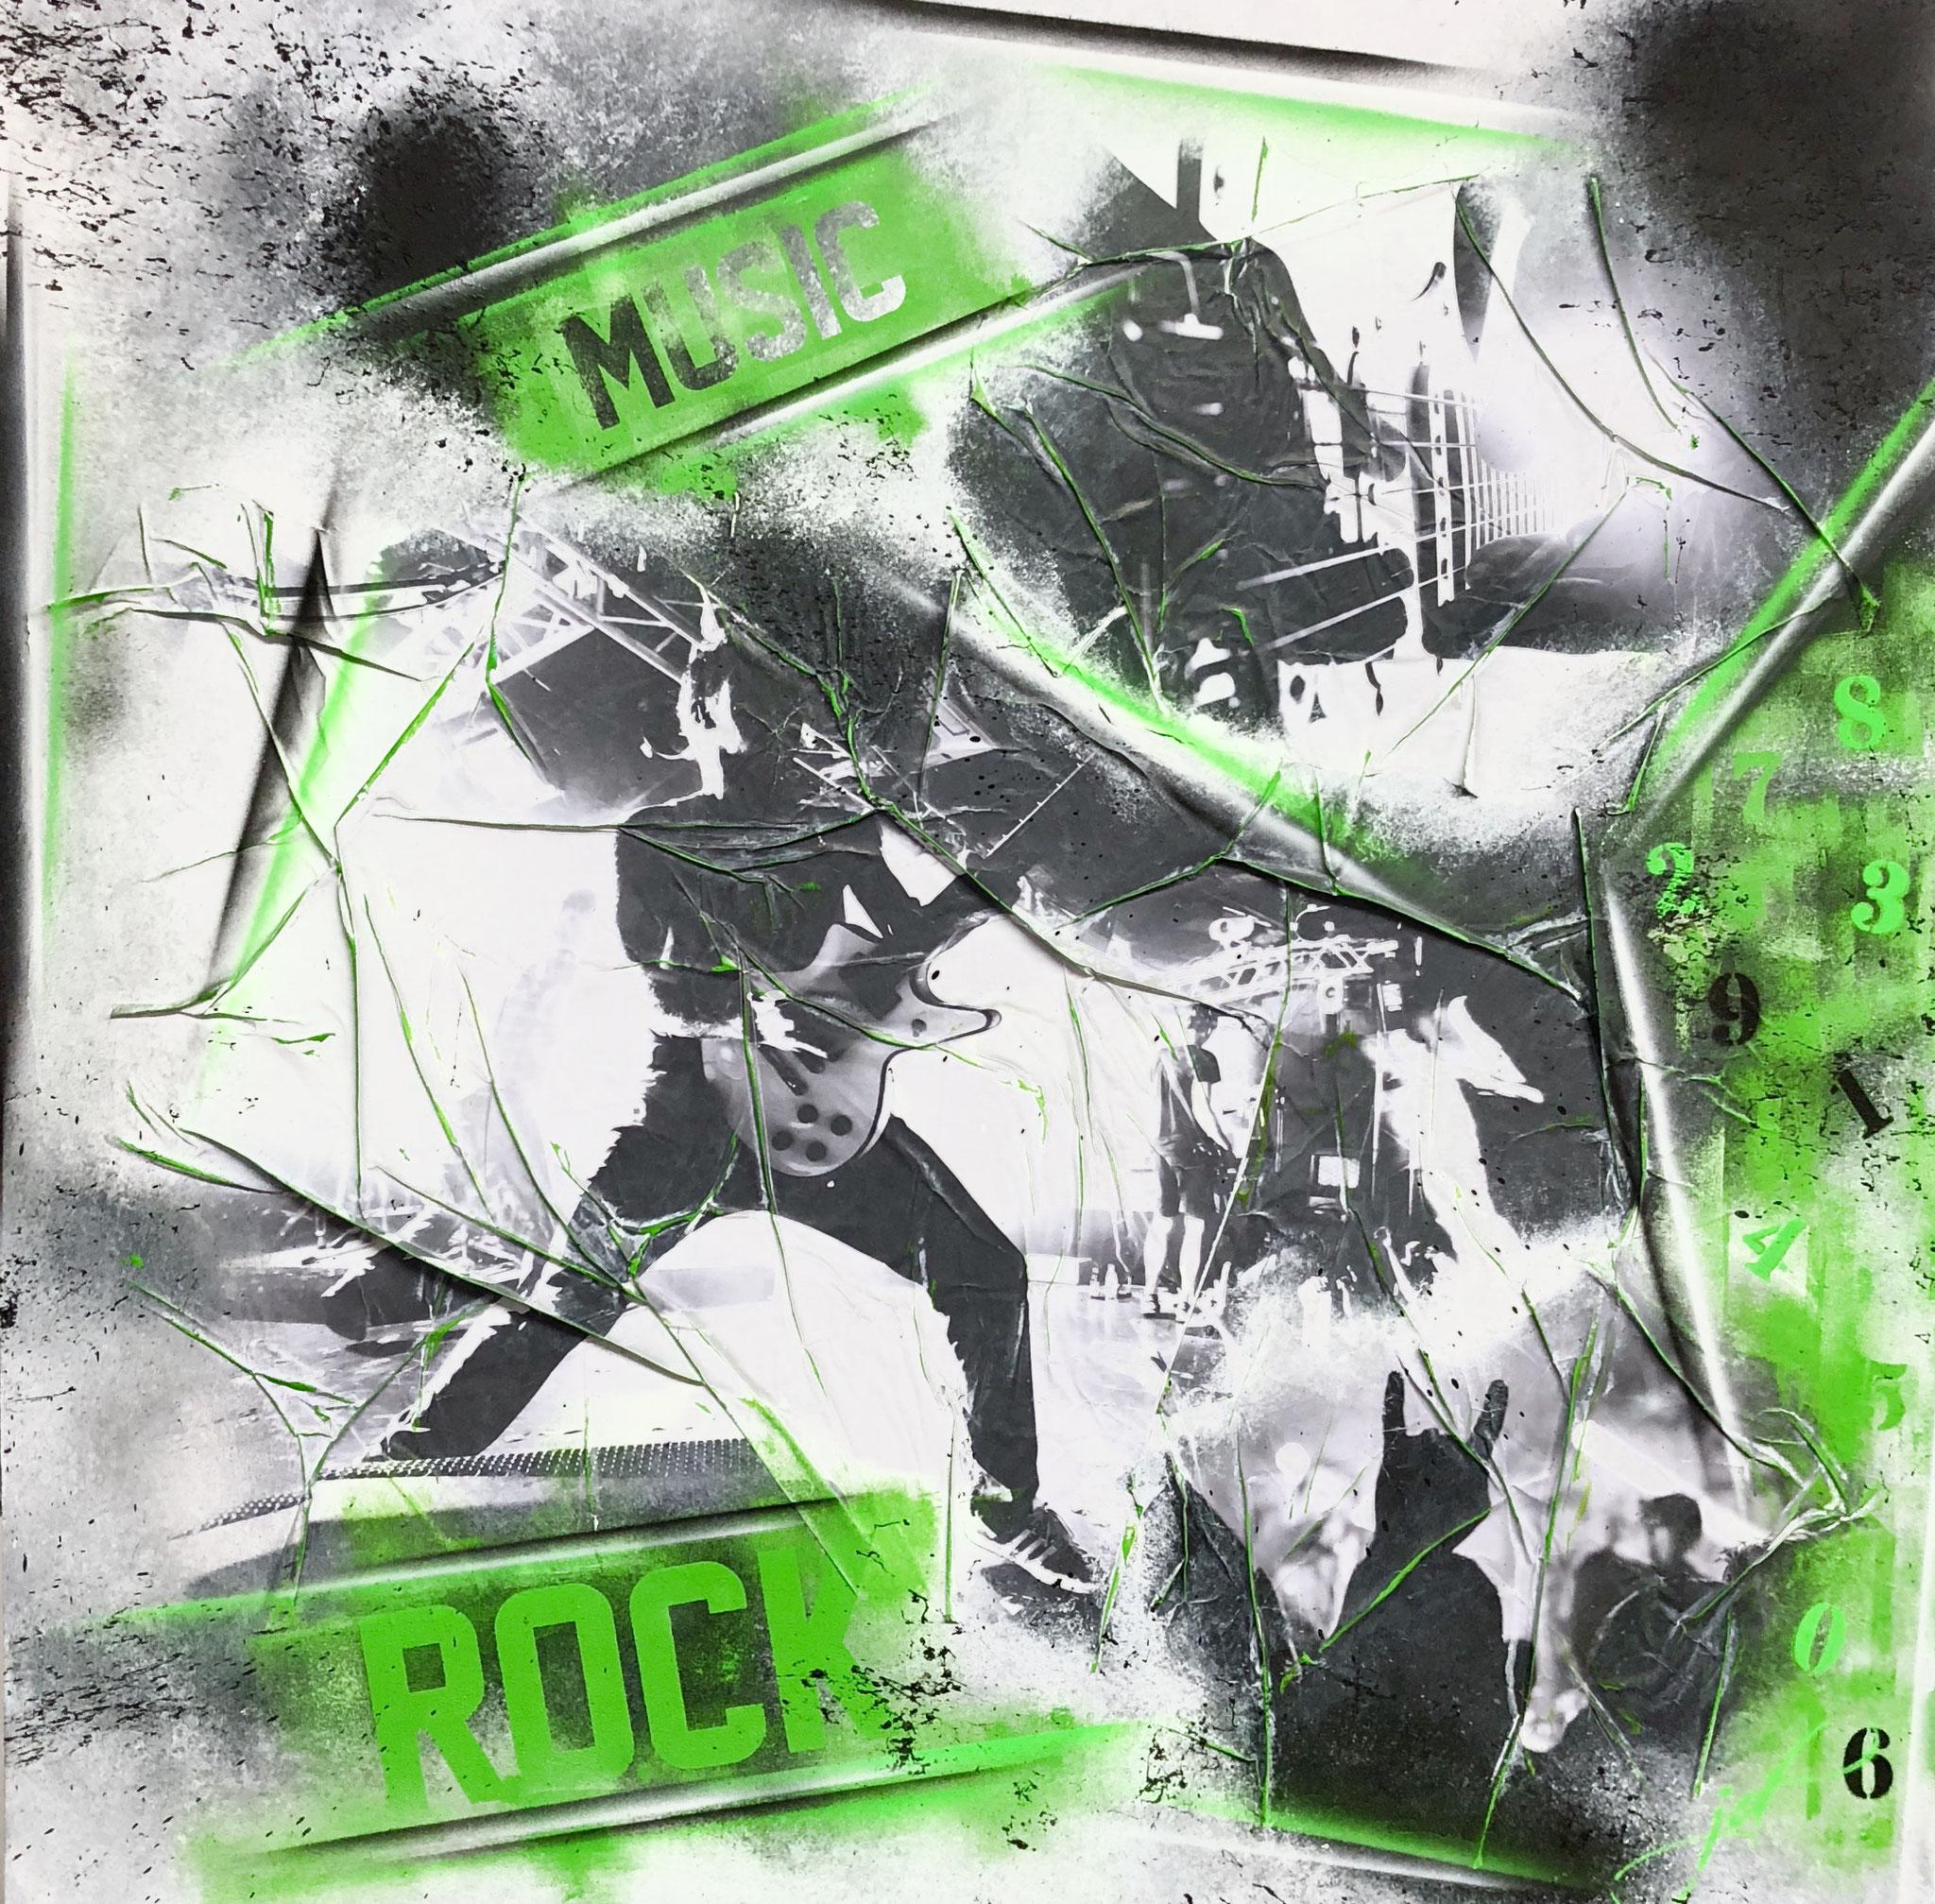 100 x 100 cm / Rockin' / Canvas and Mixmedia / 2018